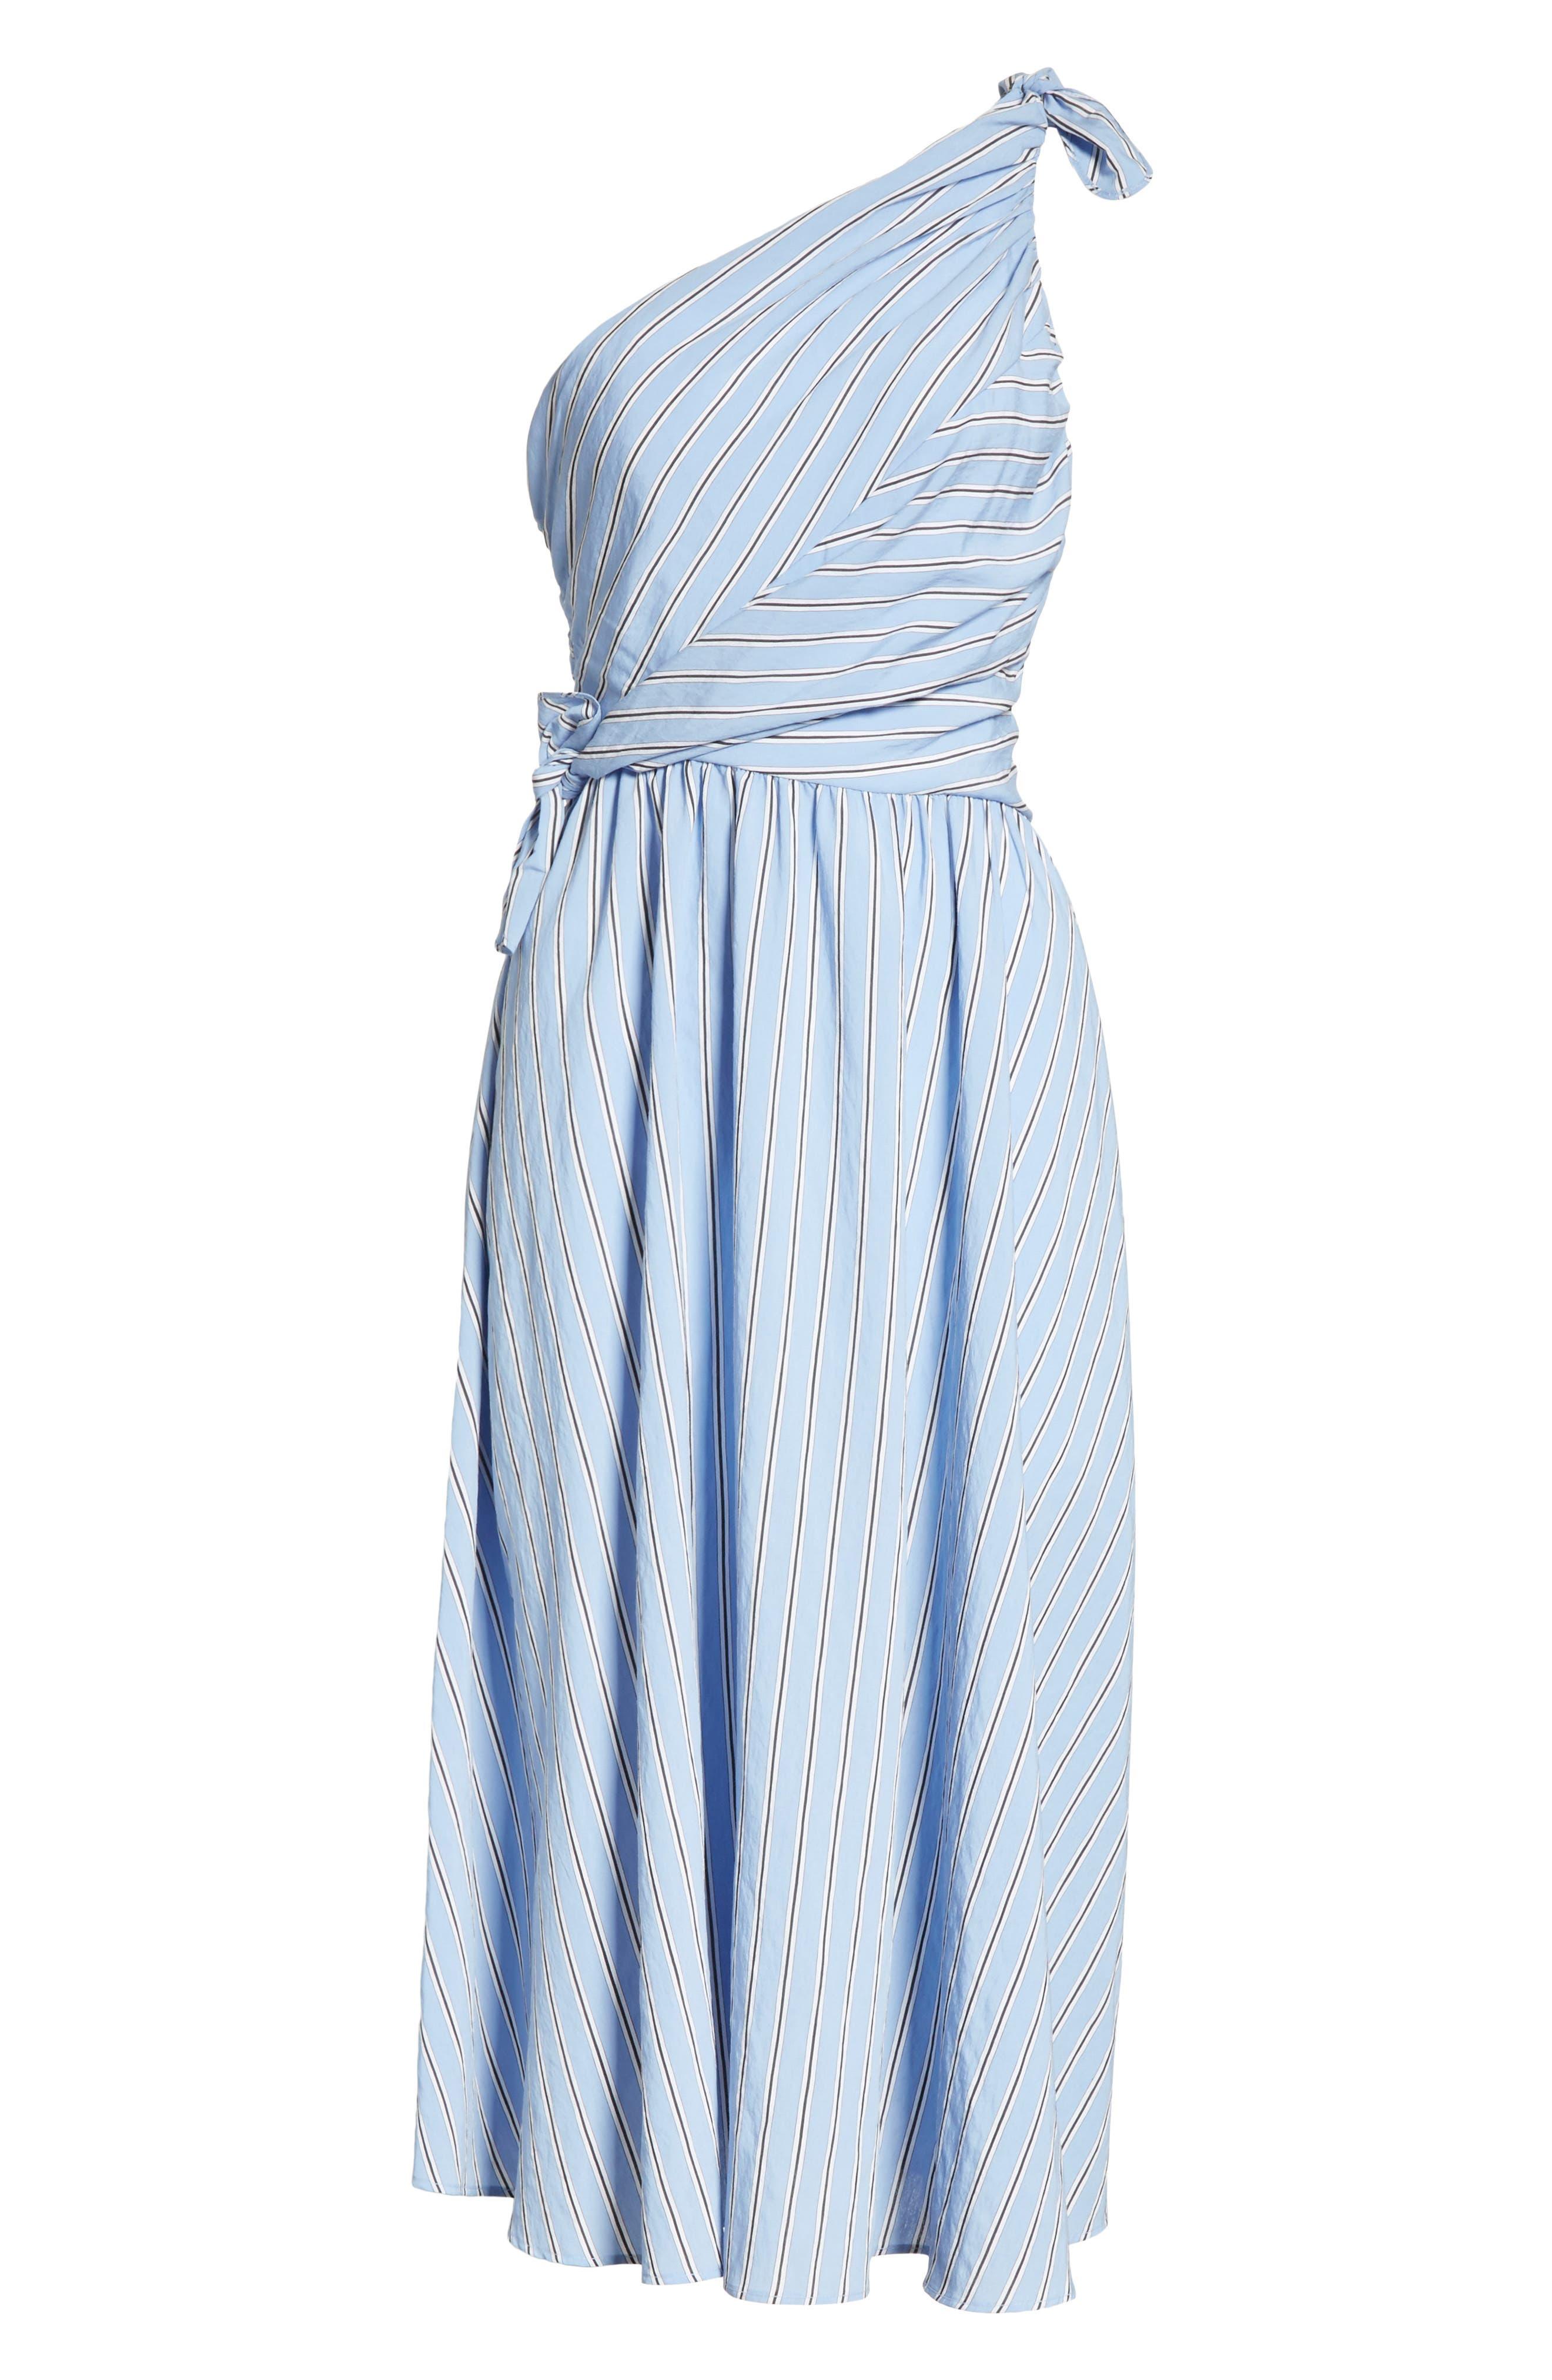 Cabrera Stripe One-Shoulder Dress,                             Alternate thumbnail 6, color,                             Olxford Blue